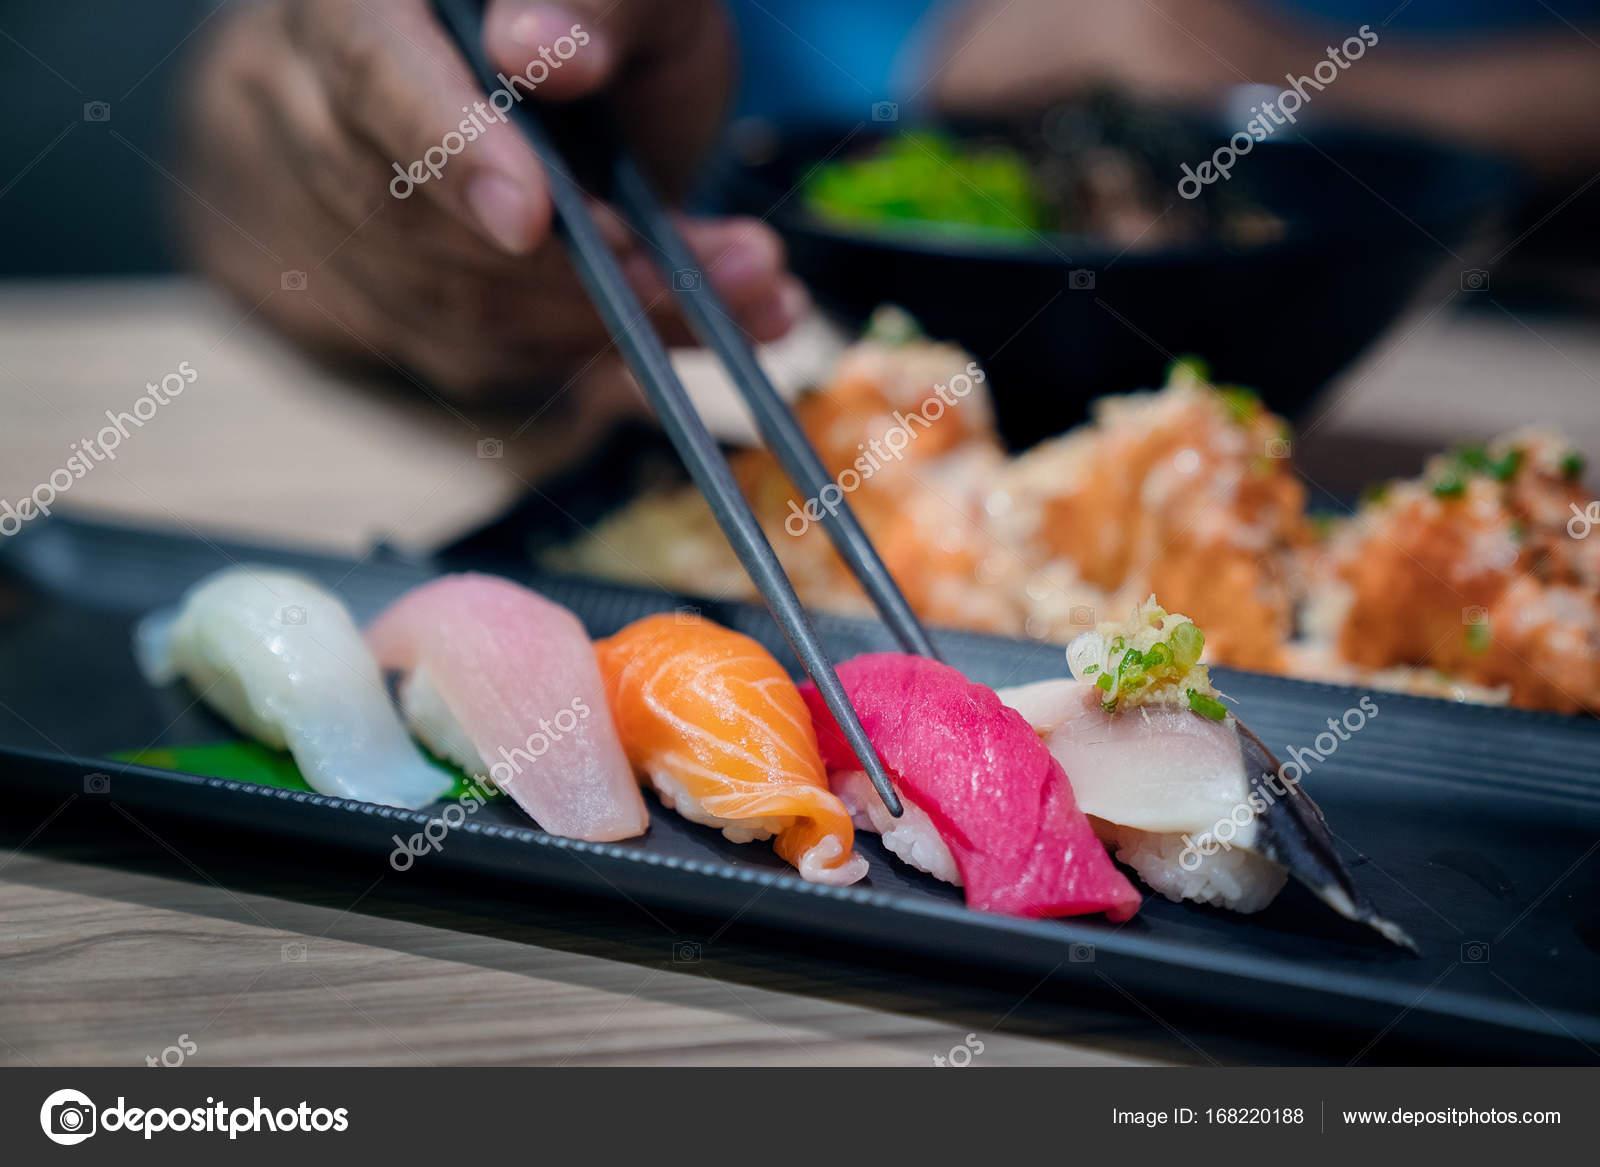 La Migliore Cucina Giapponese Sushi U2014 Foto Stock